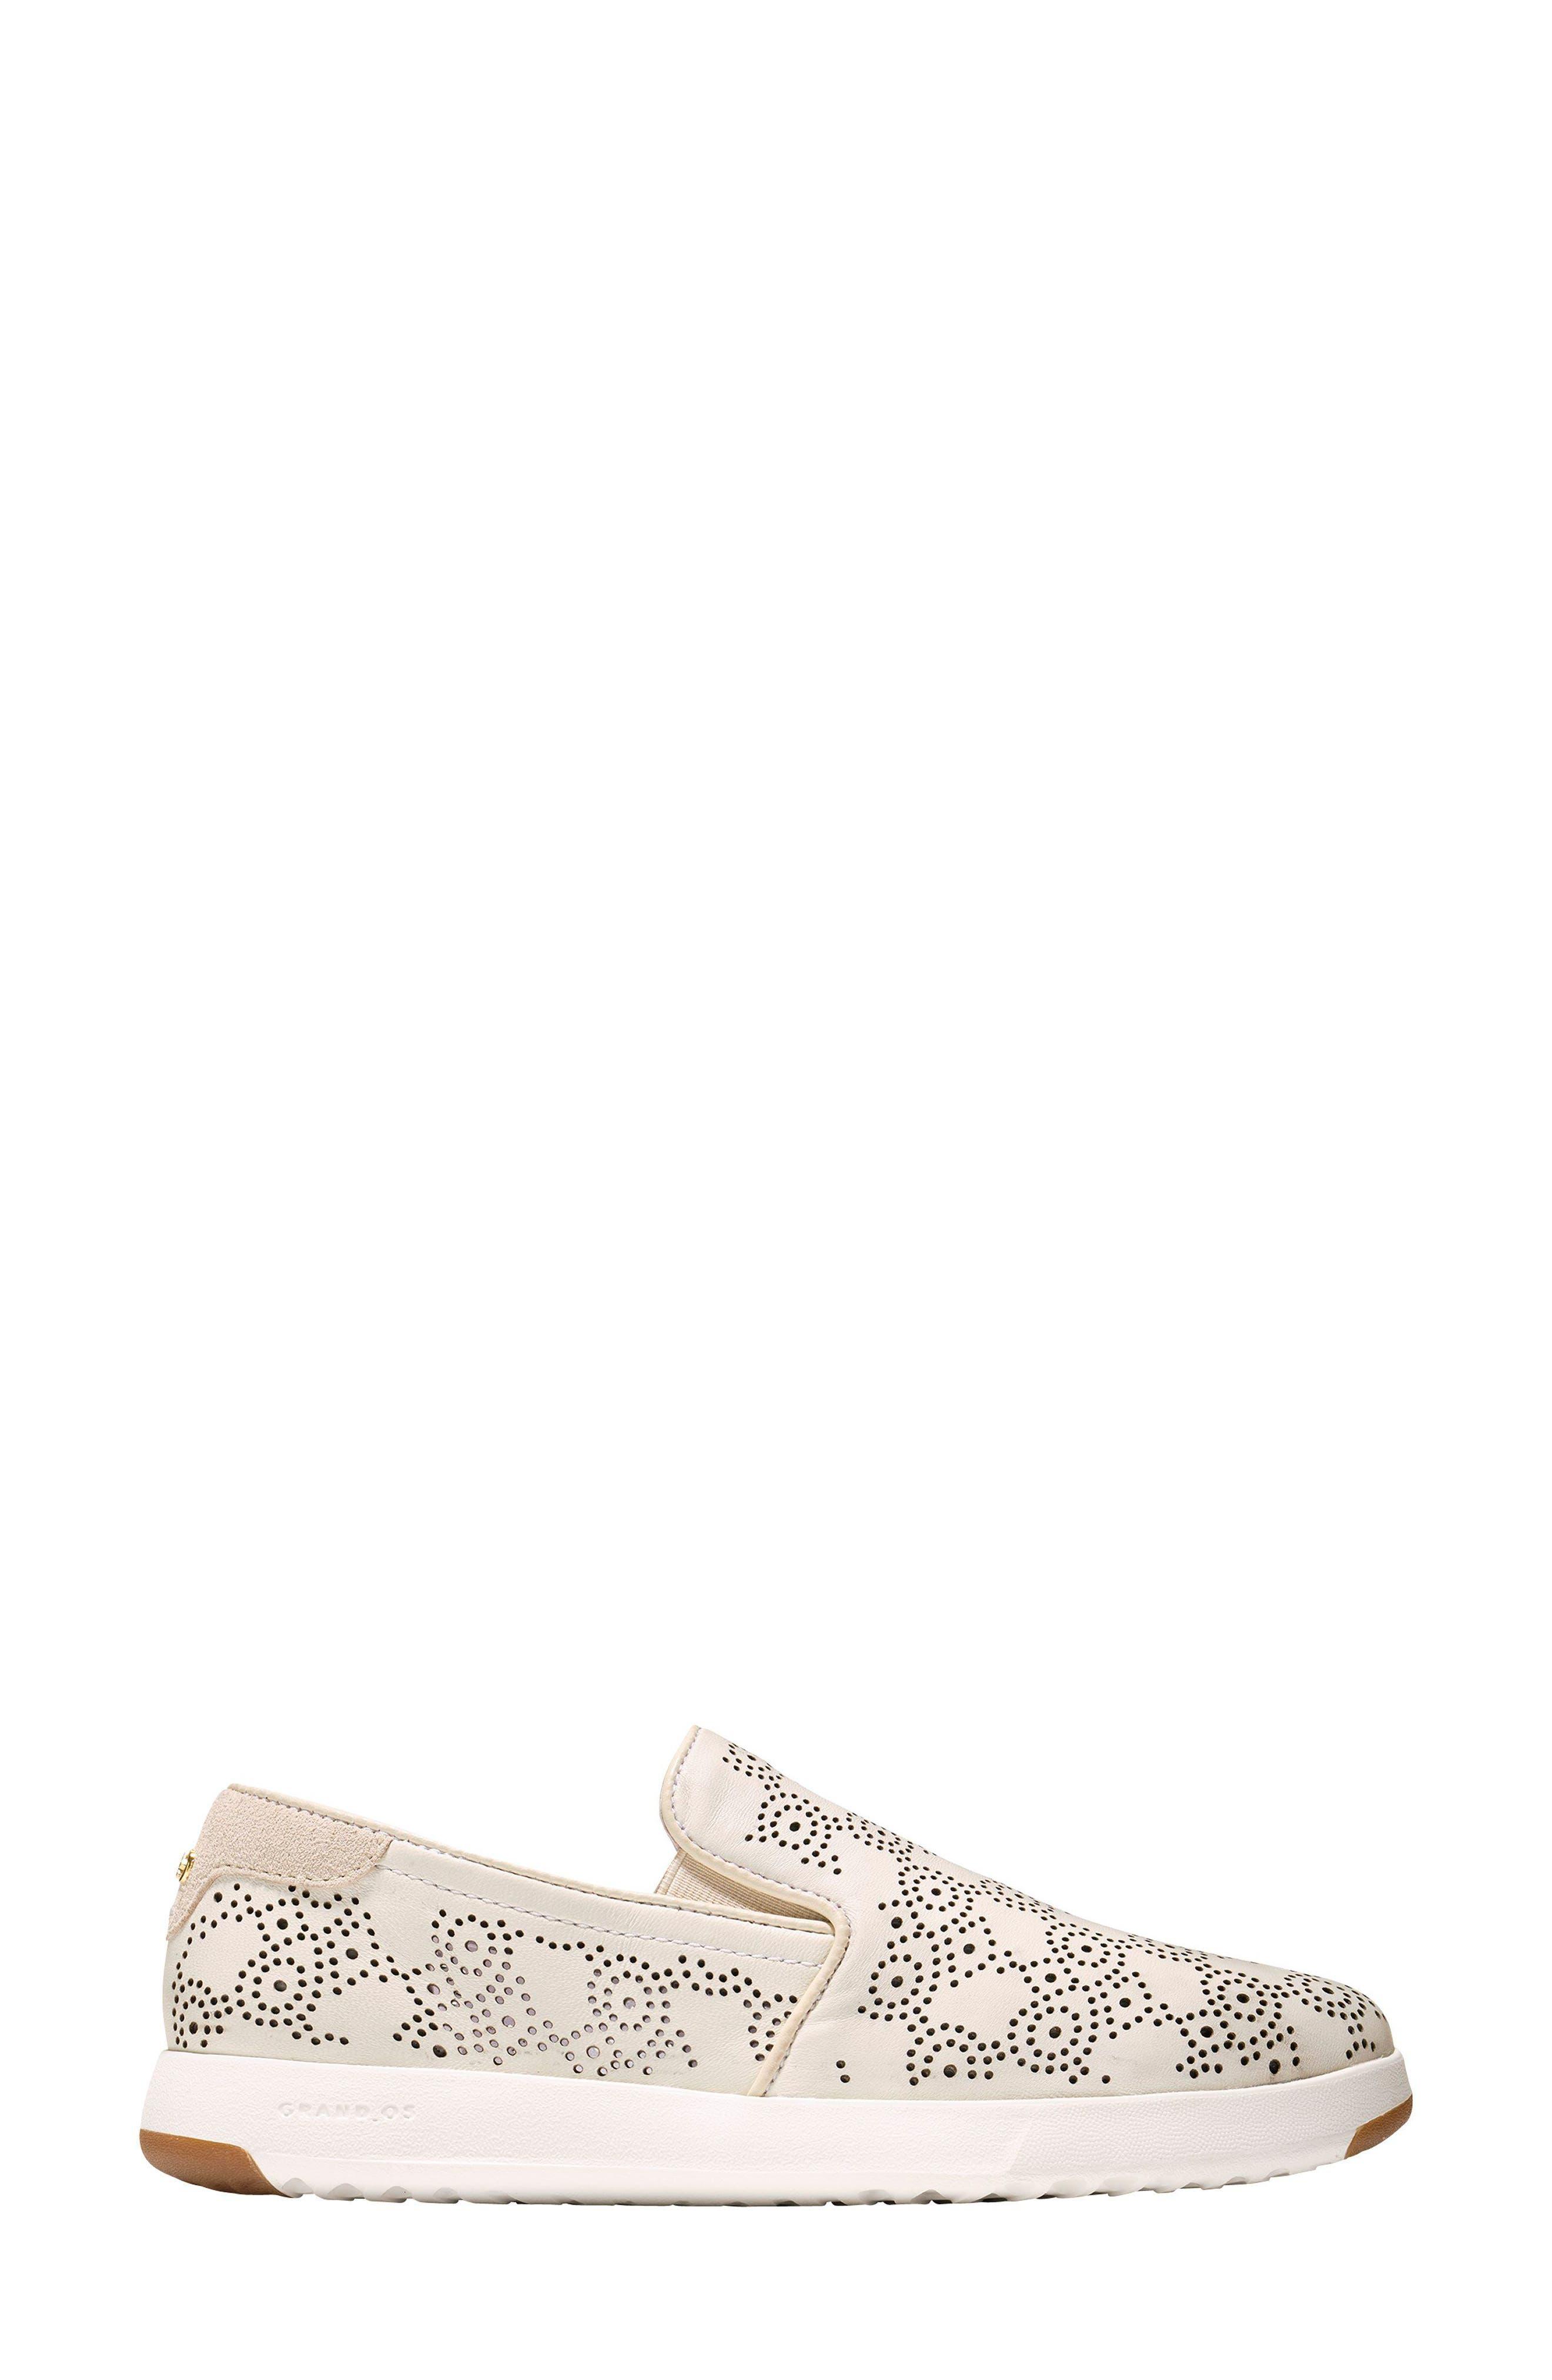 GrandPro Perforated Slip-On Sneaker,                             Alternate thumbnail 5, color,